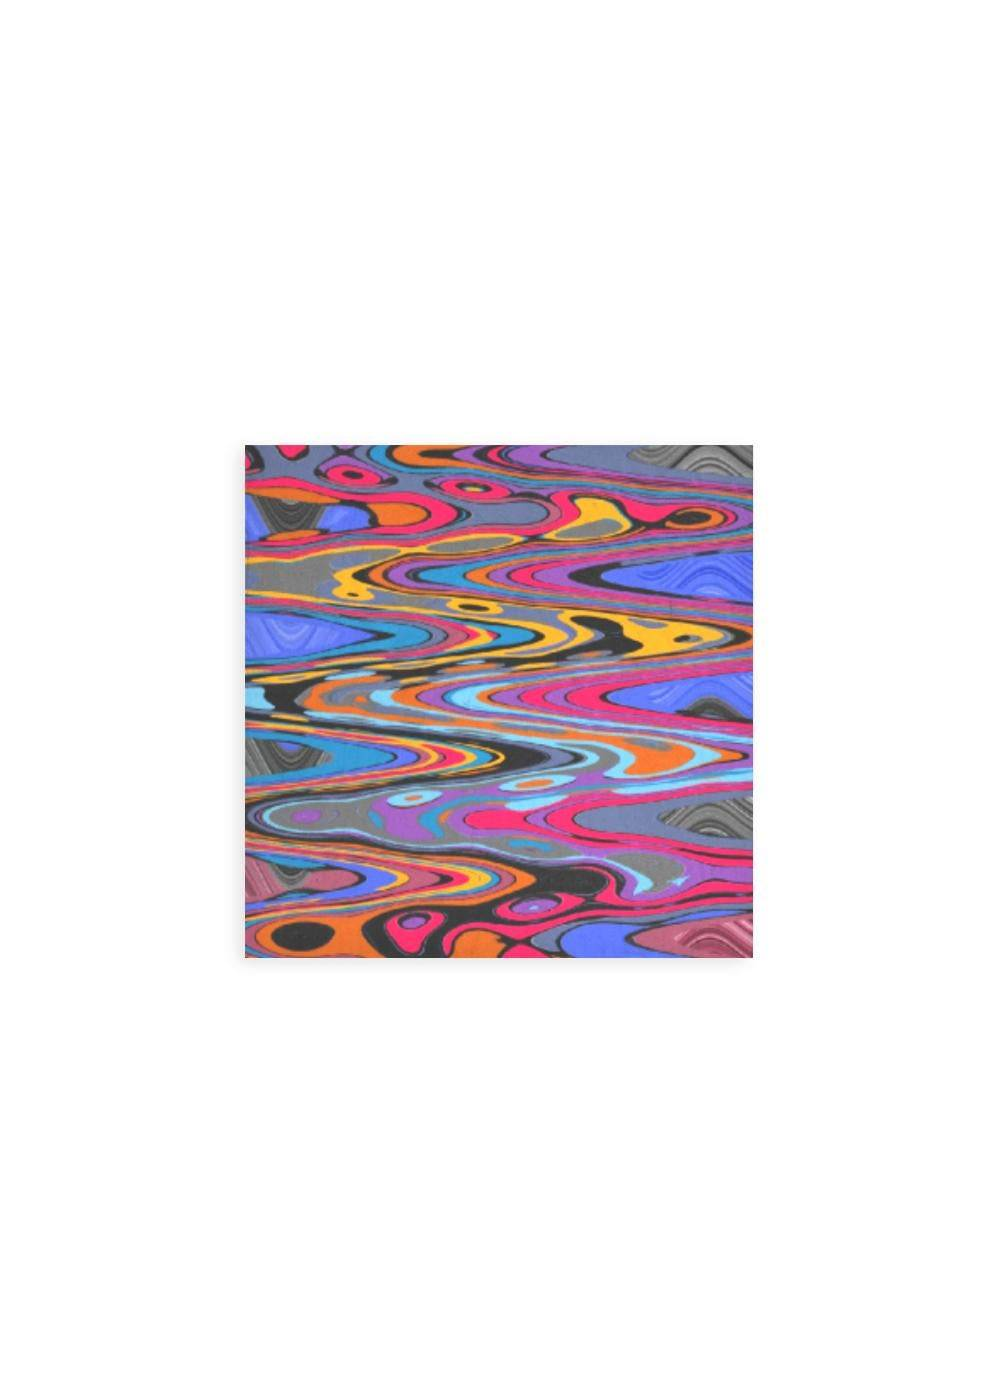 VIDA Wood Wall Art - 12x12 - Vibration Pop Music 2021 by VIDA Original Artist  - Size: Small